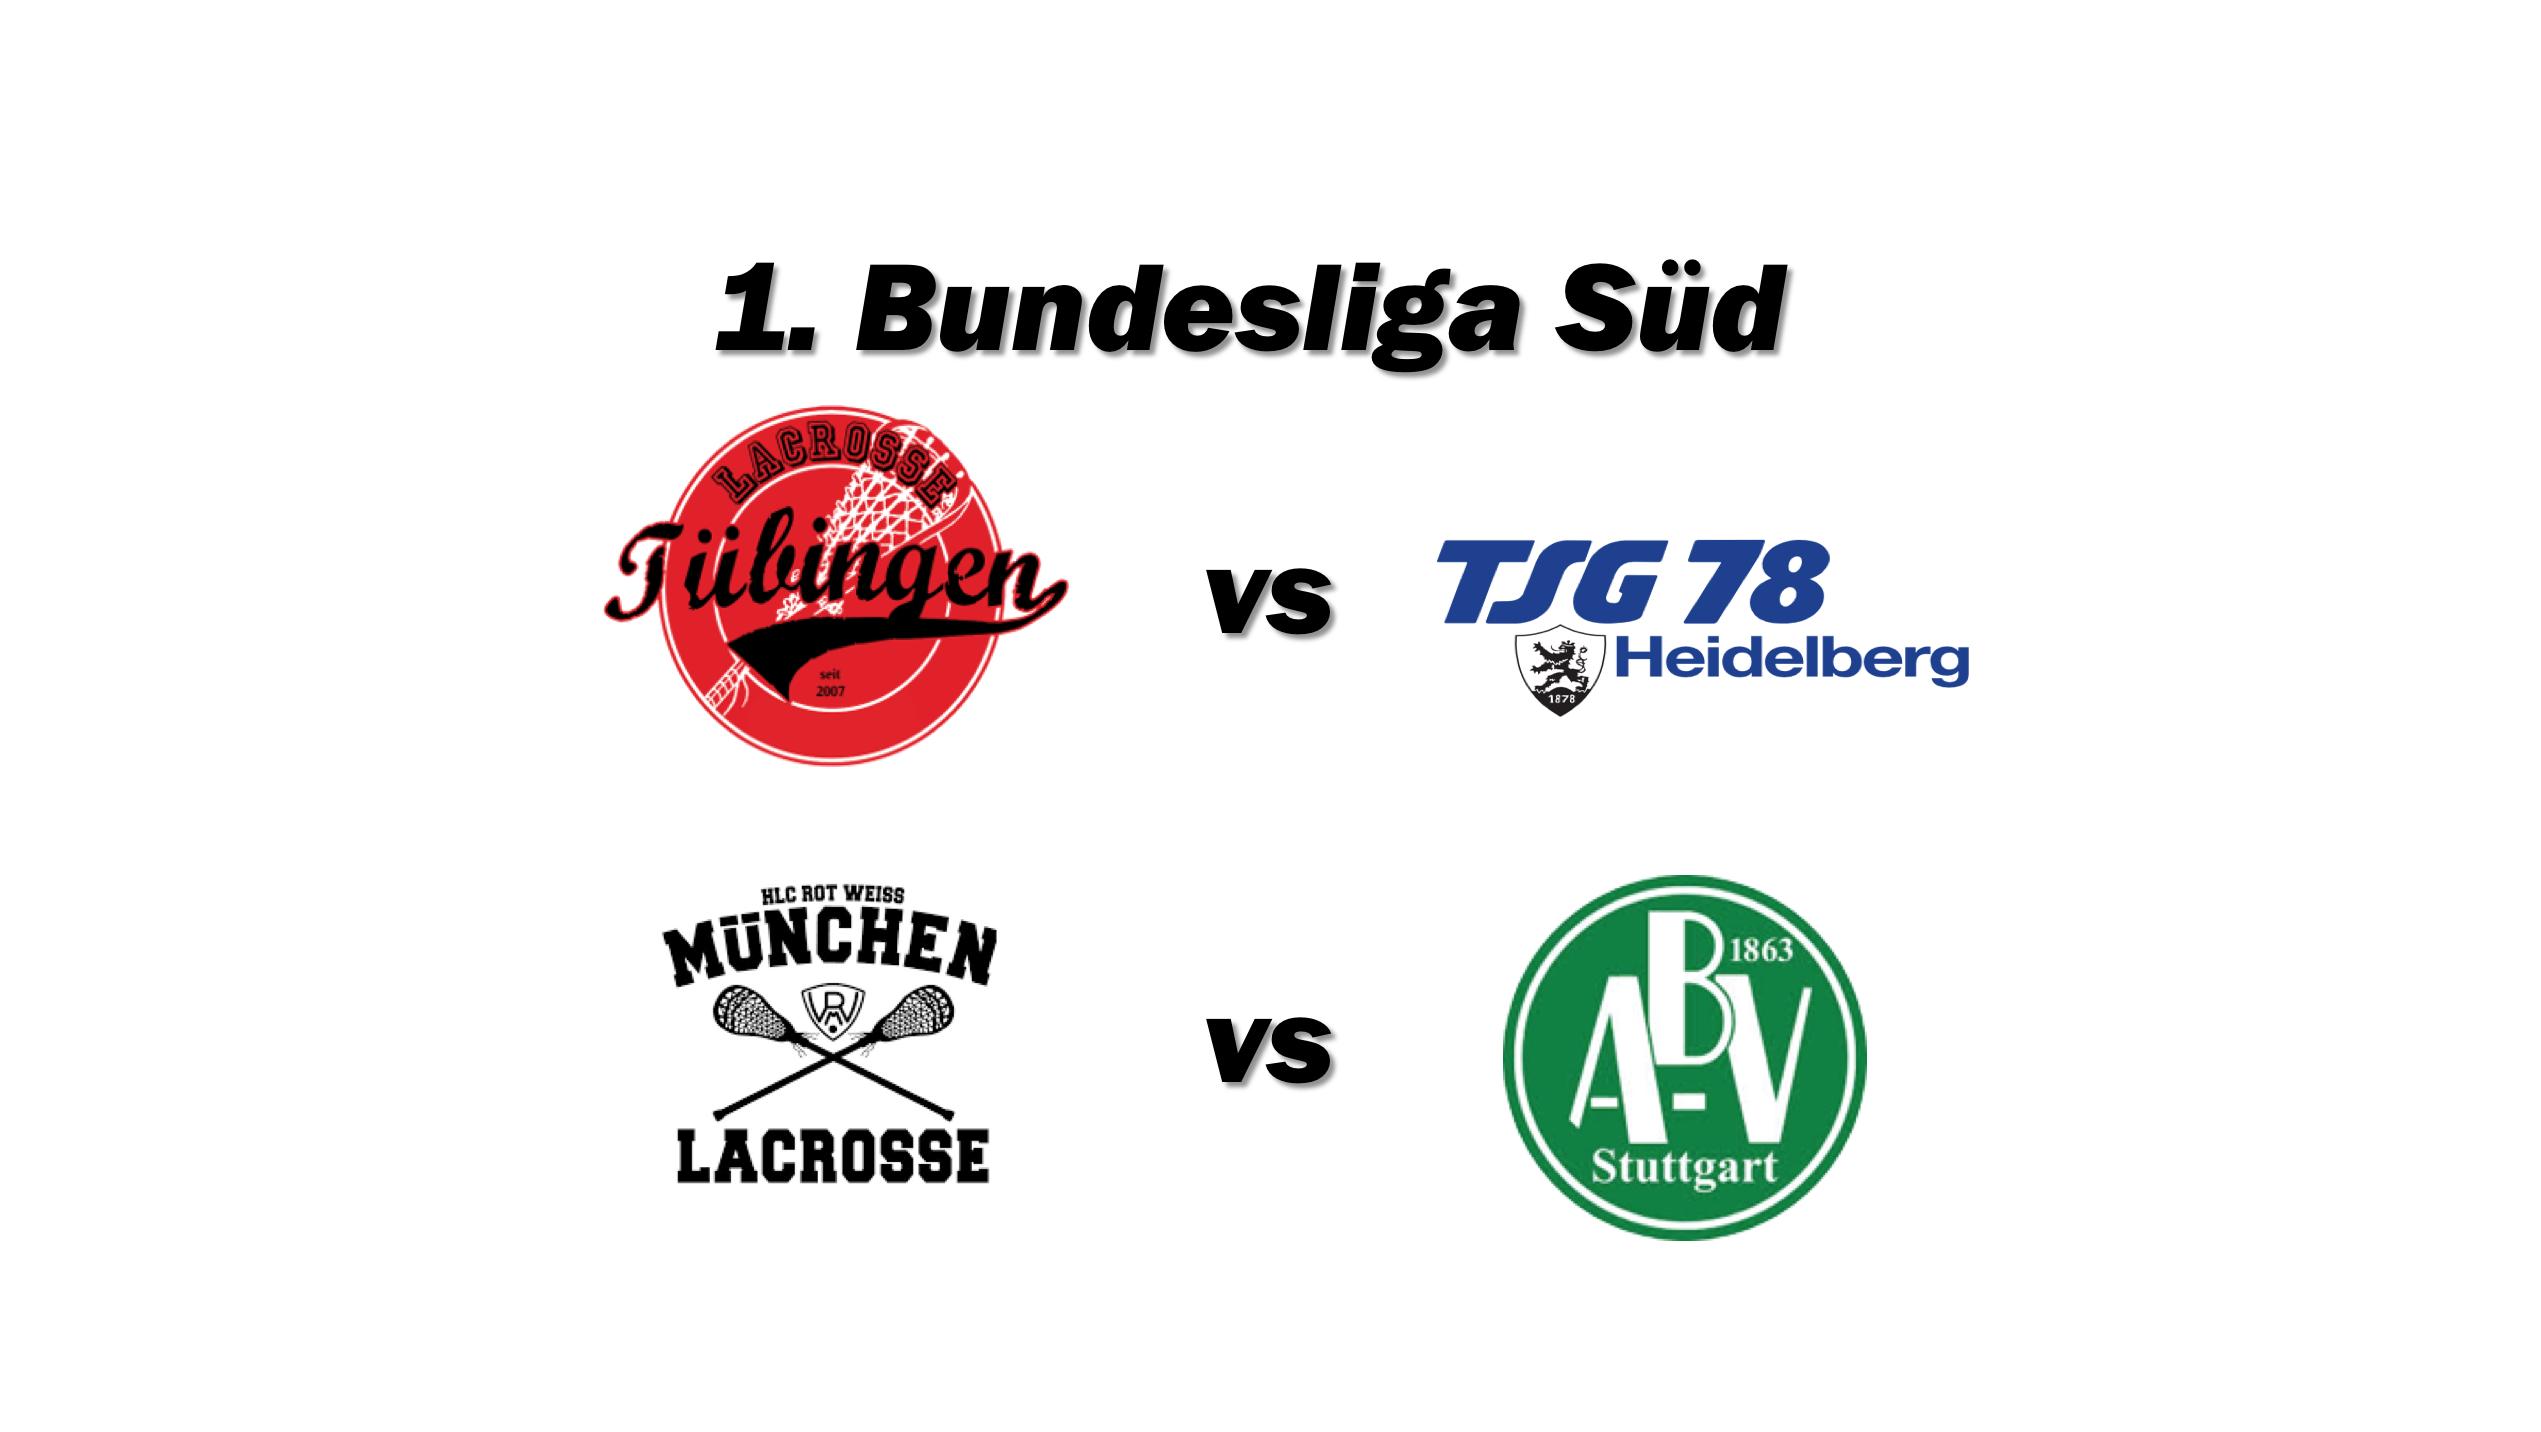 1. Bundesliga Süd der Damen